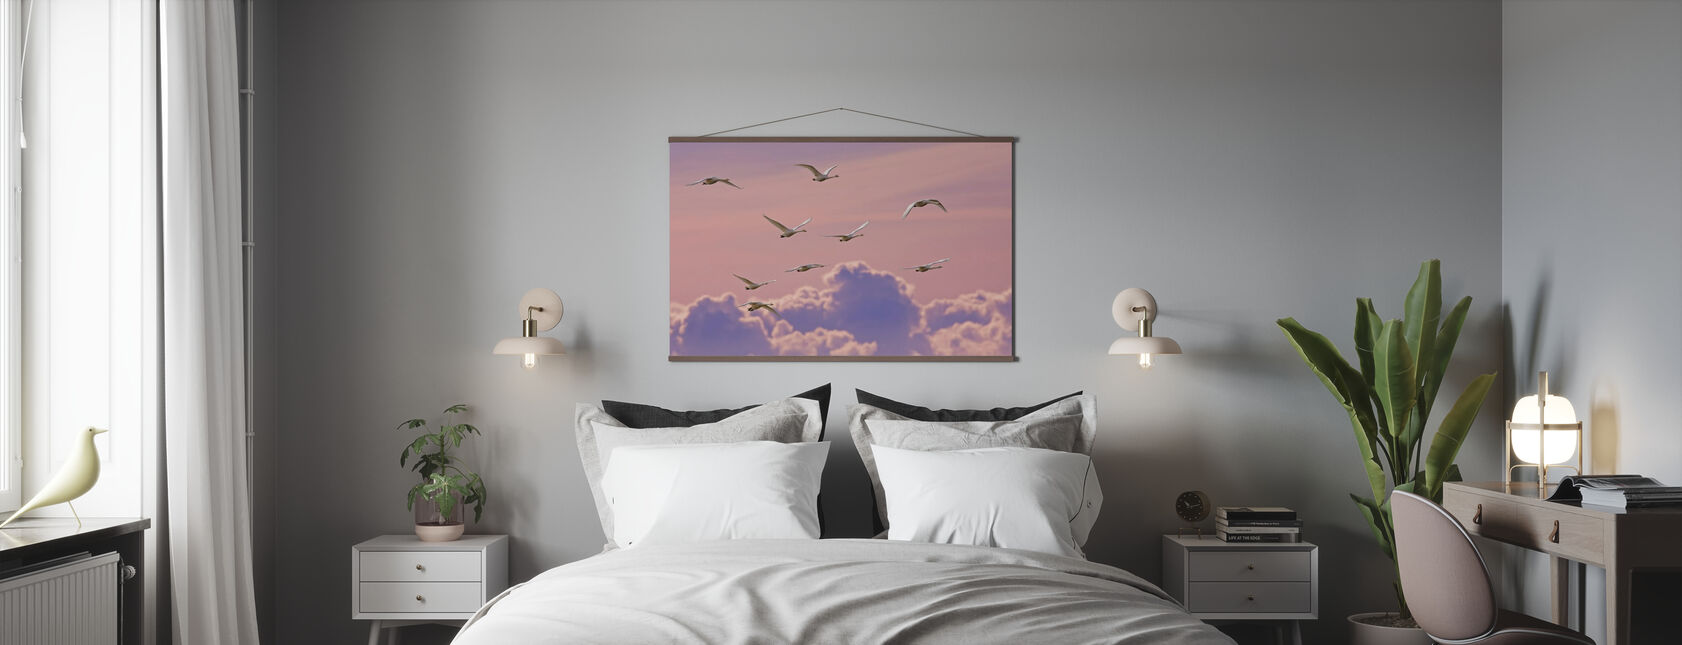 Whooper Swans - Poster - Bedroom